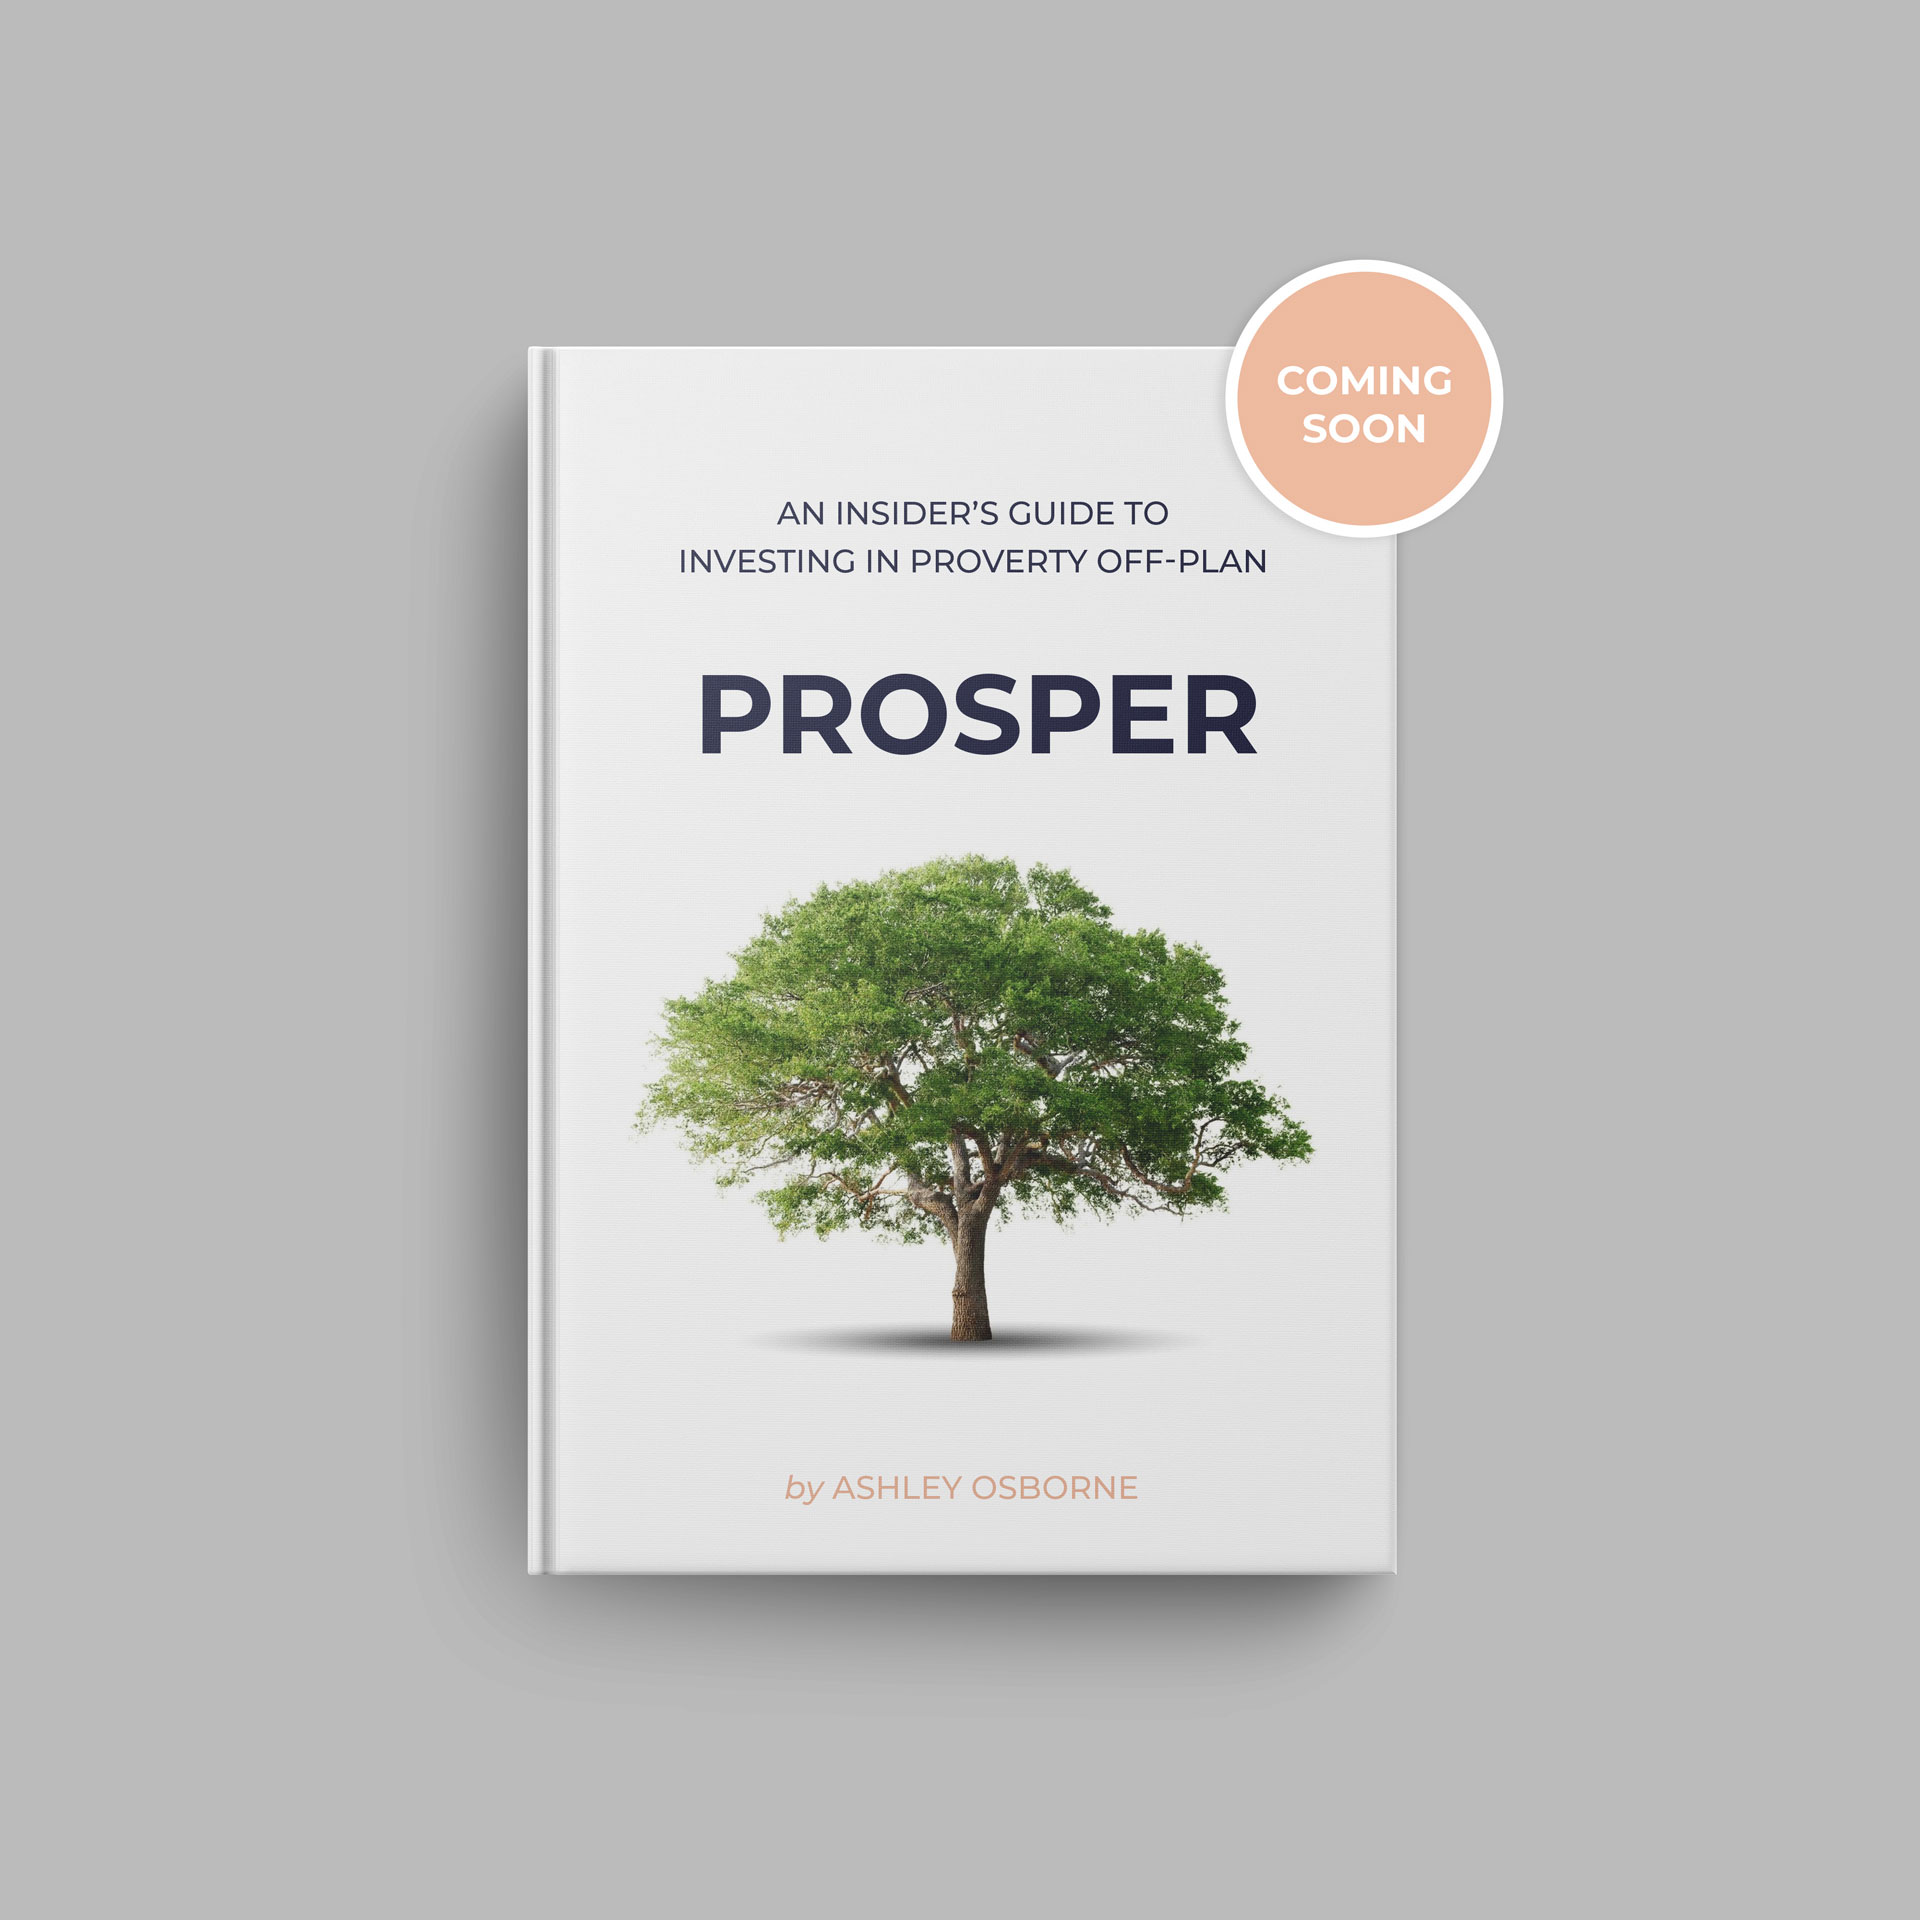 Prosper Book Cover PropTech Pioneer